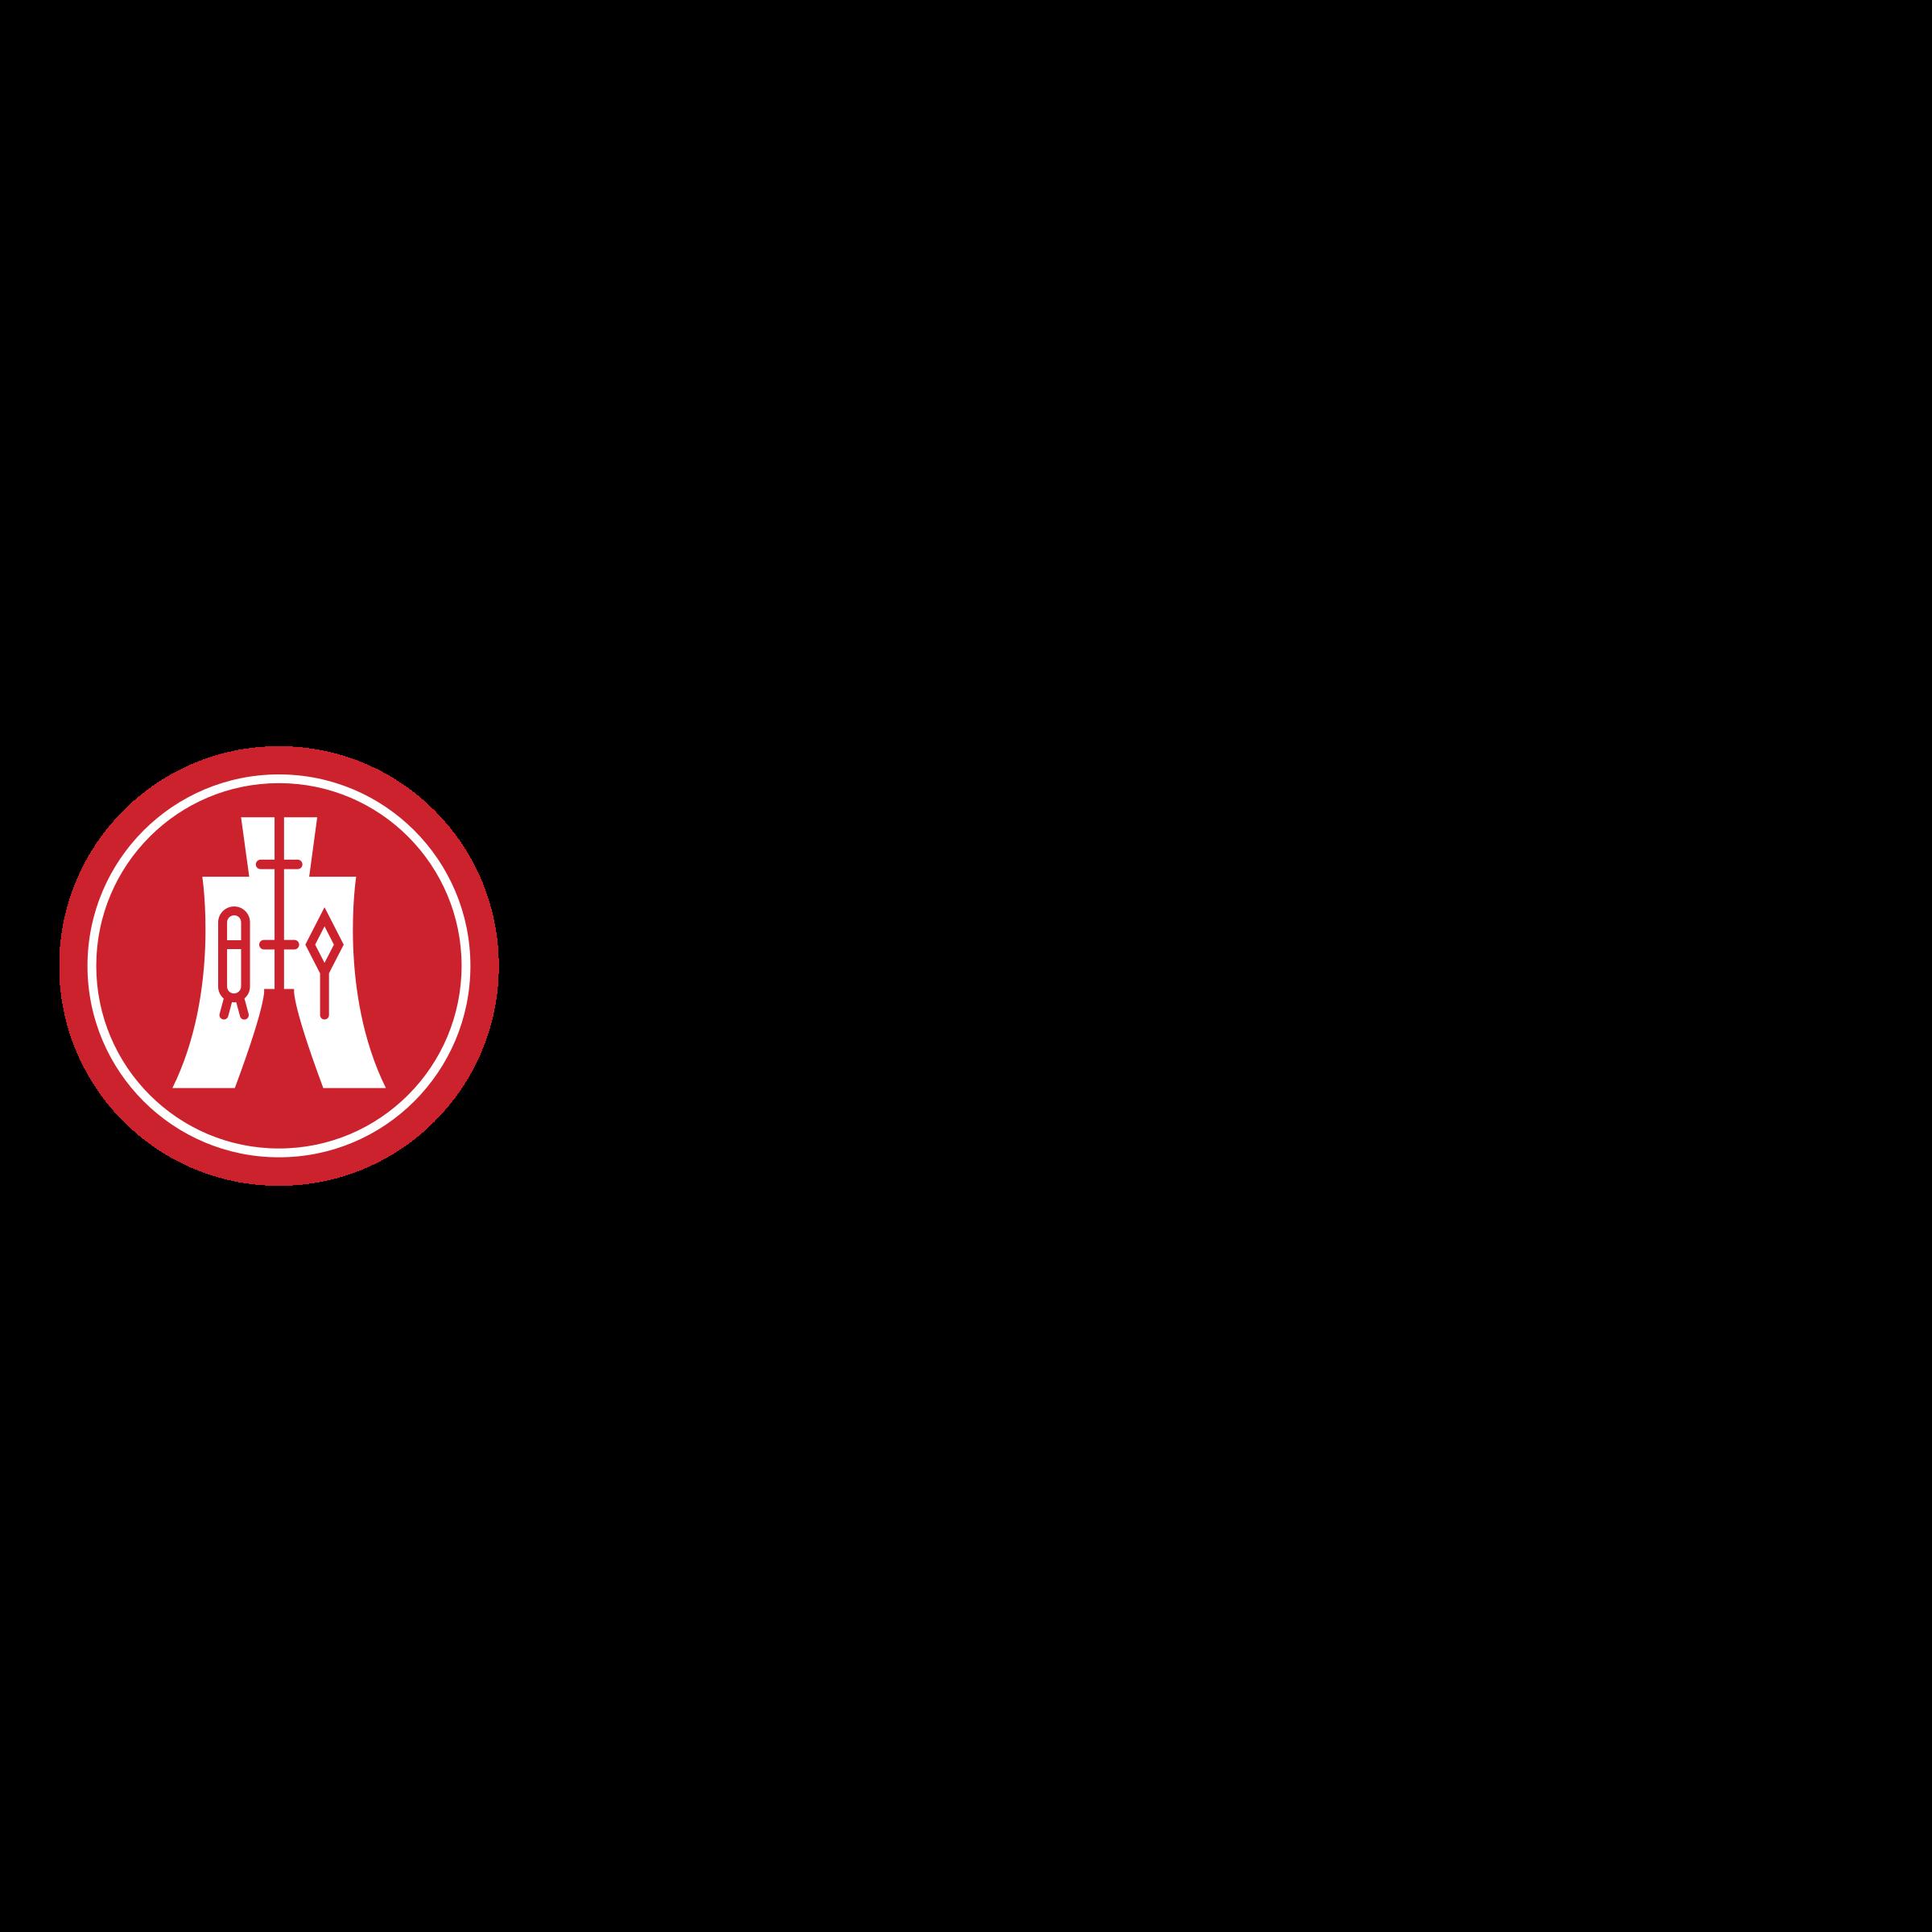 Hang Seng Bank Logo Png